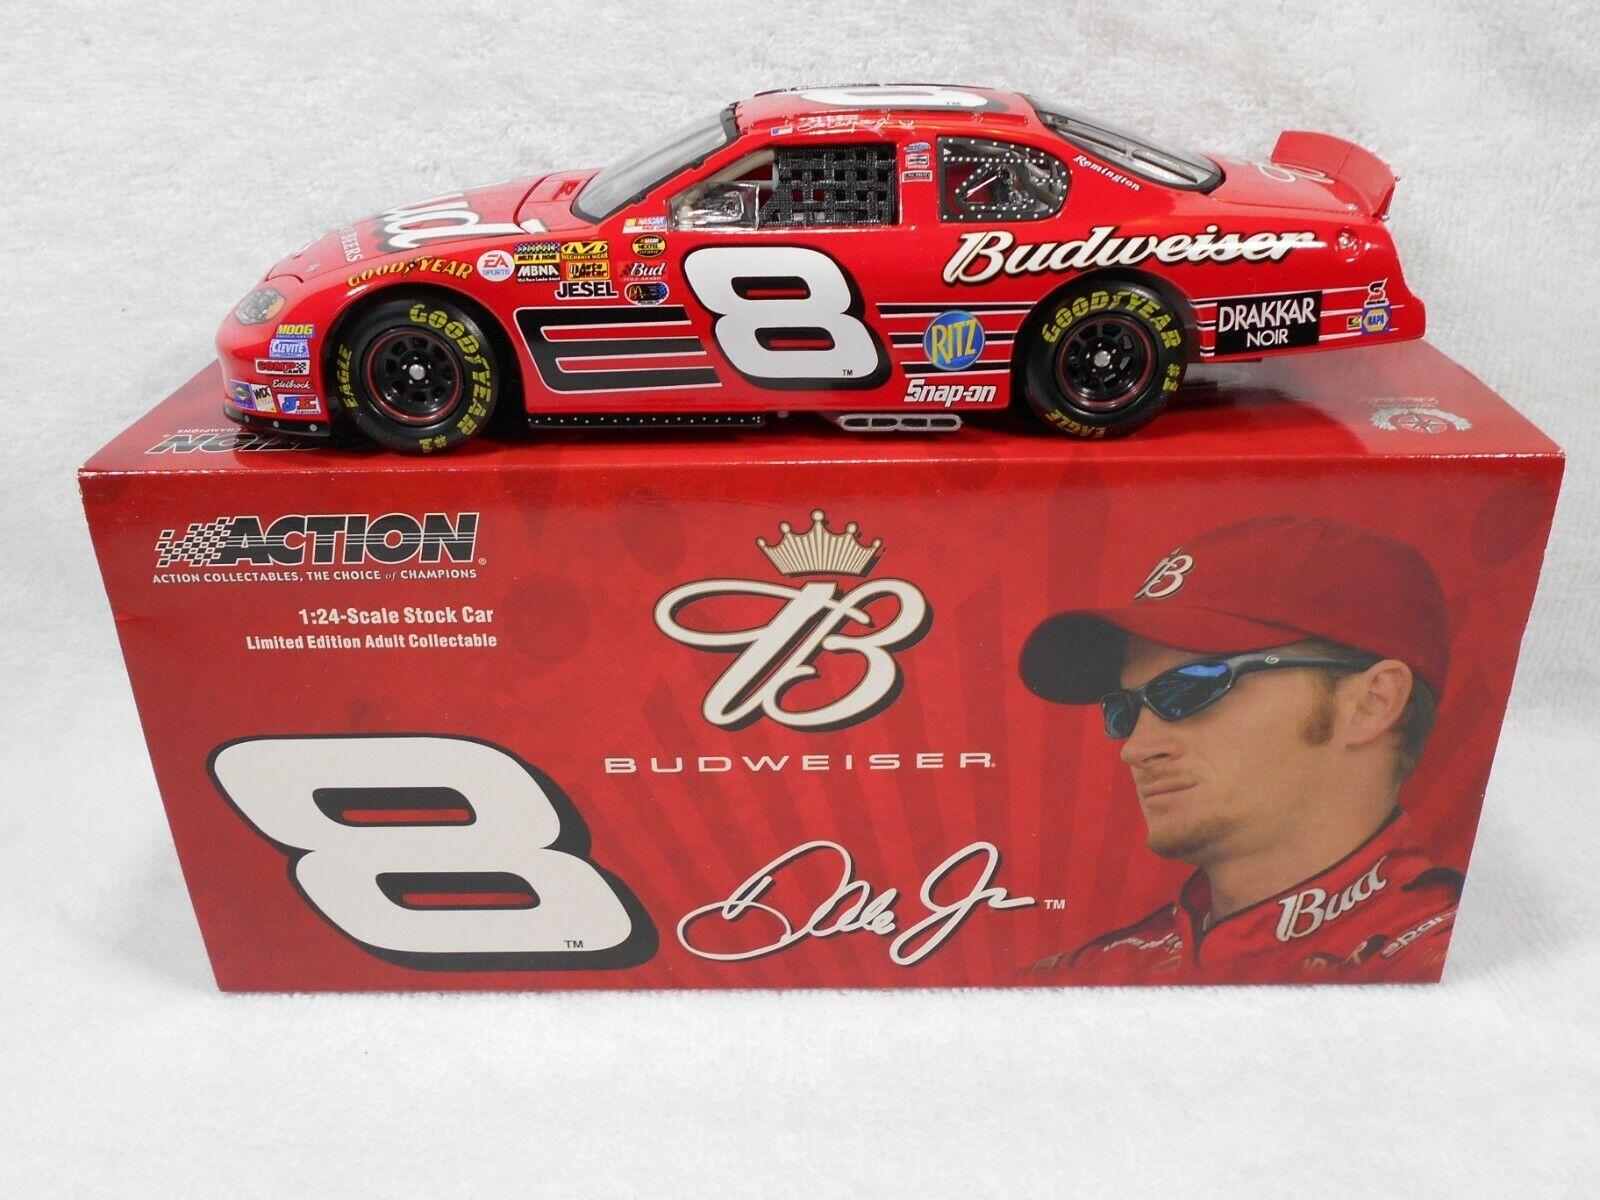 DALE EARNHARDT JR 8 BUDWEISER 1/24 ACTION 2004 NASCAR DIECAST - $24.99